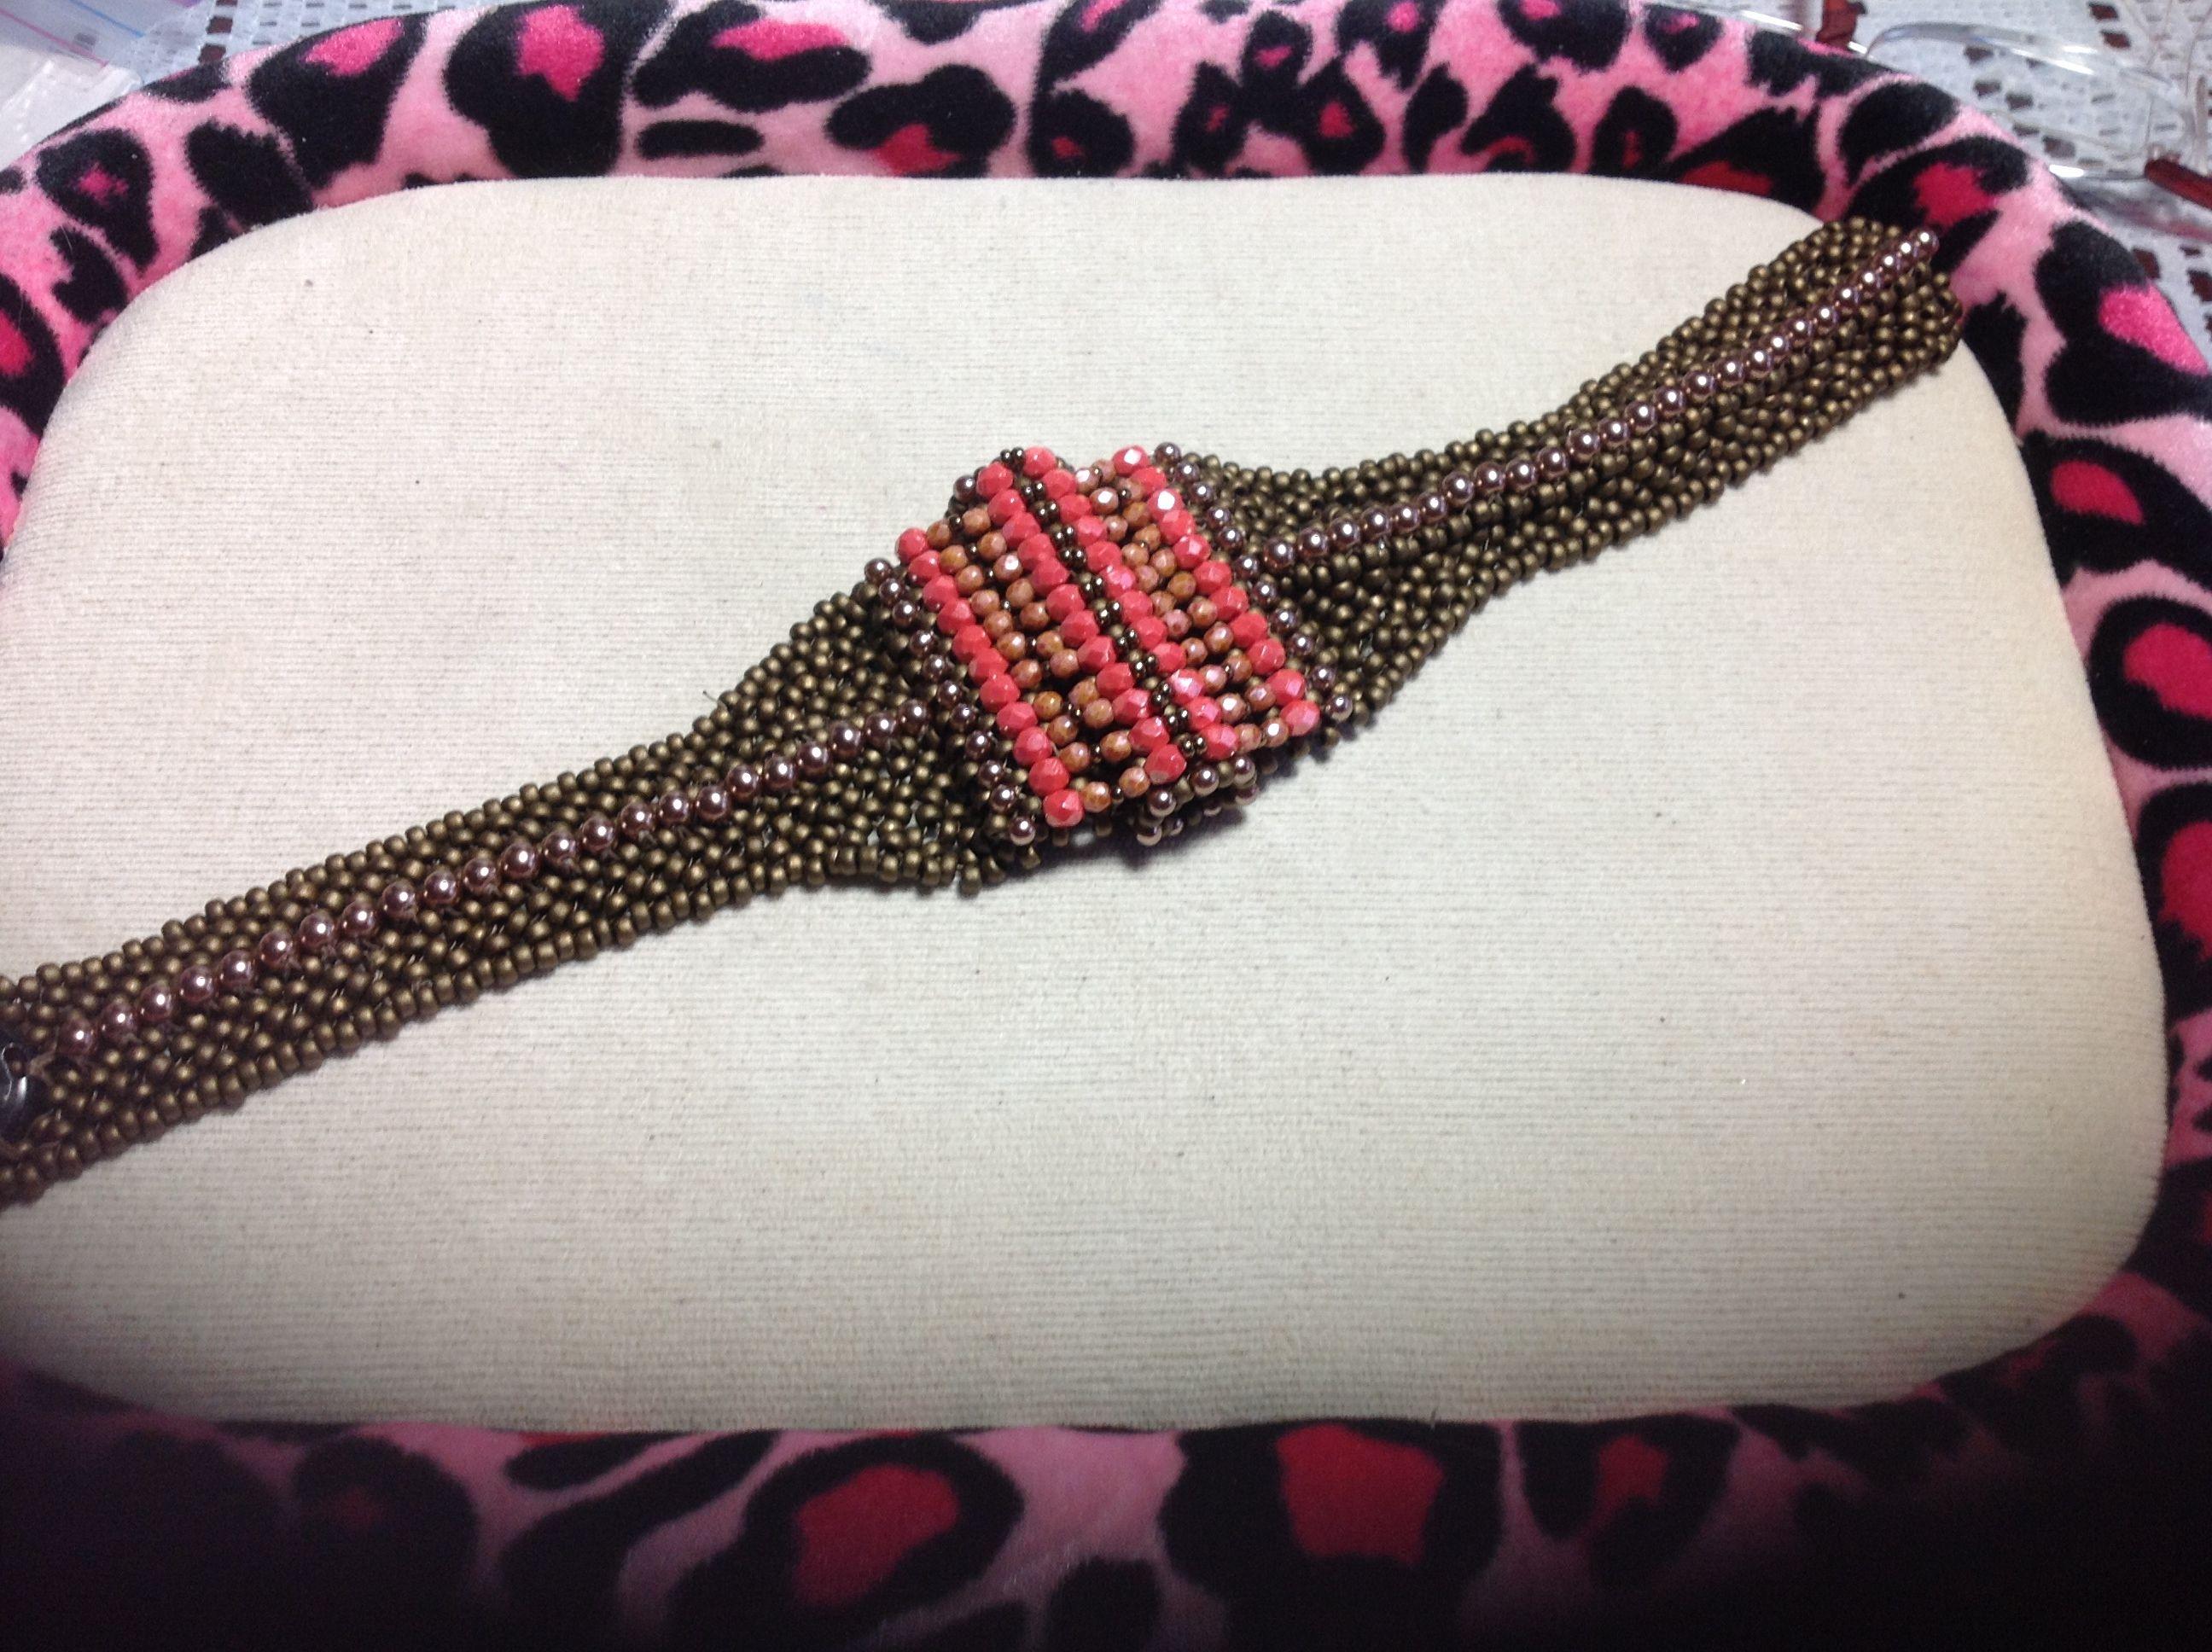 Heart Bead Again designed by Shelley Pleines Nybakke